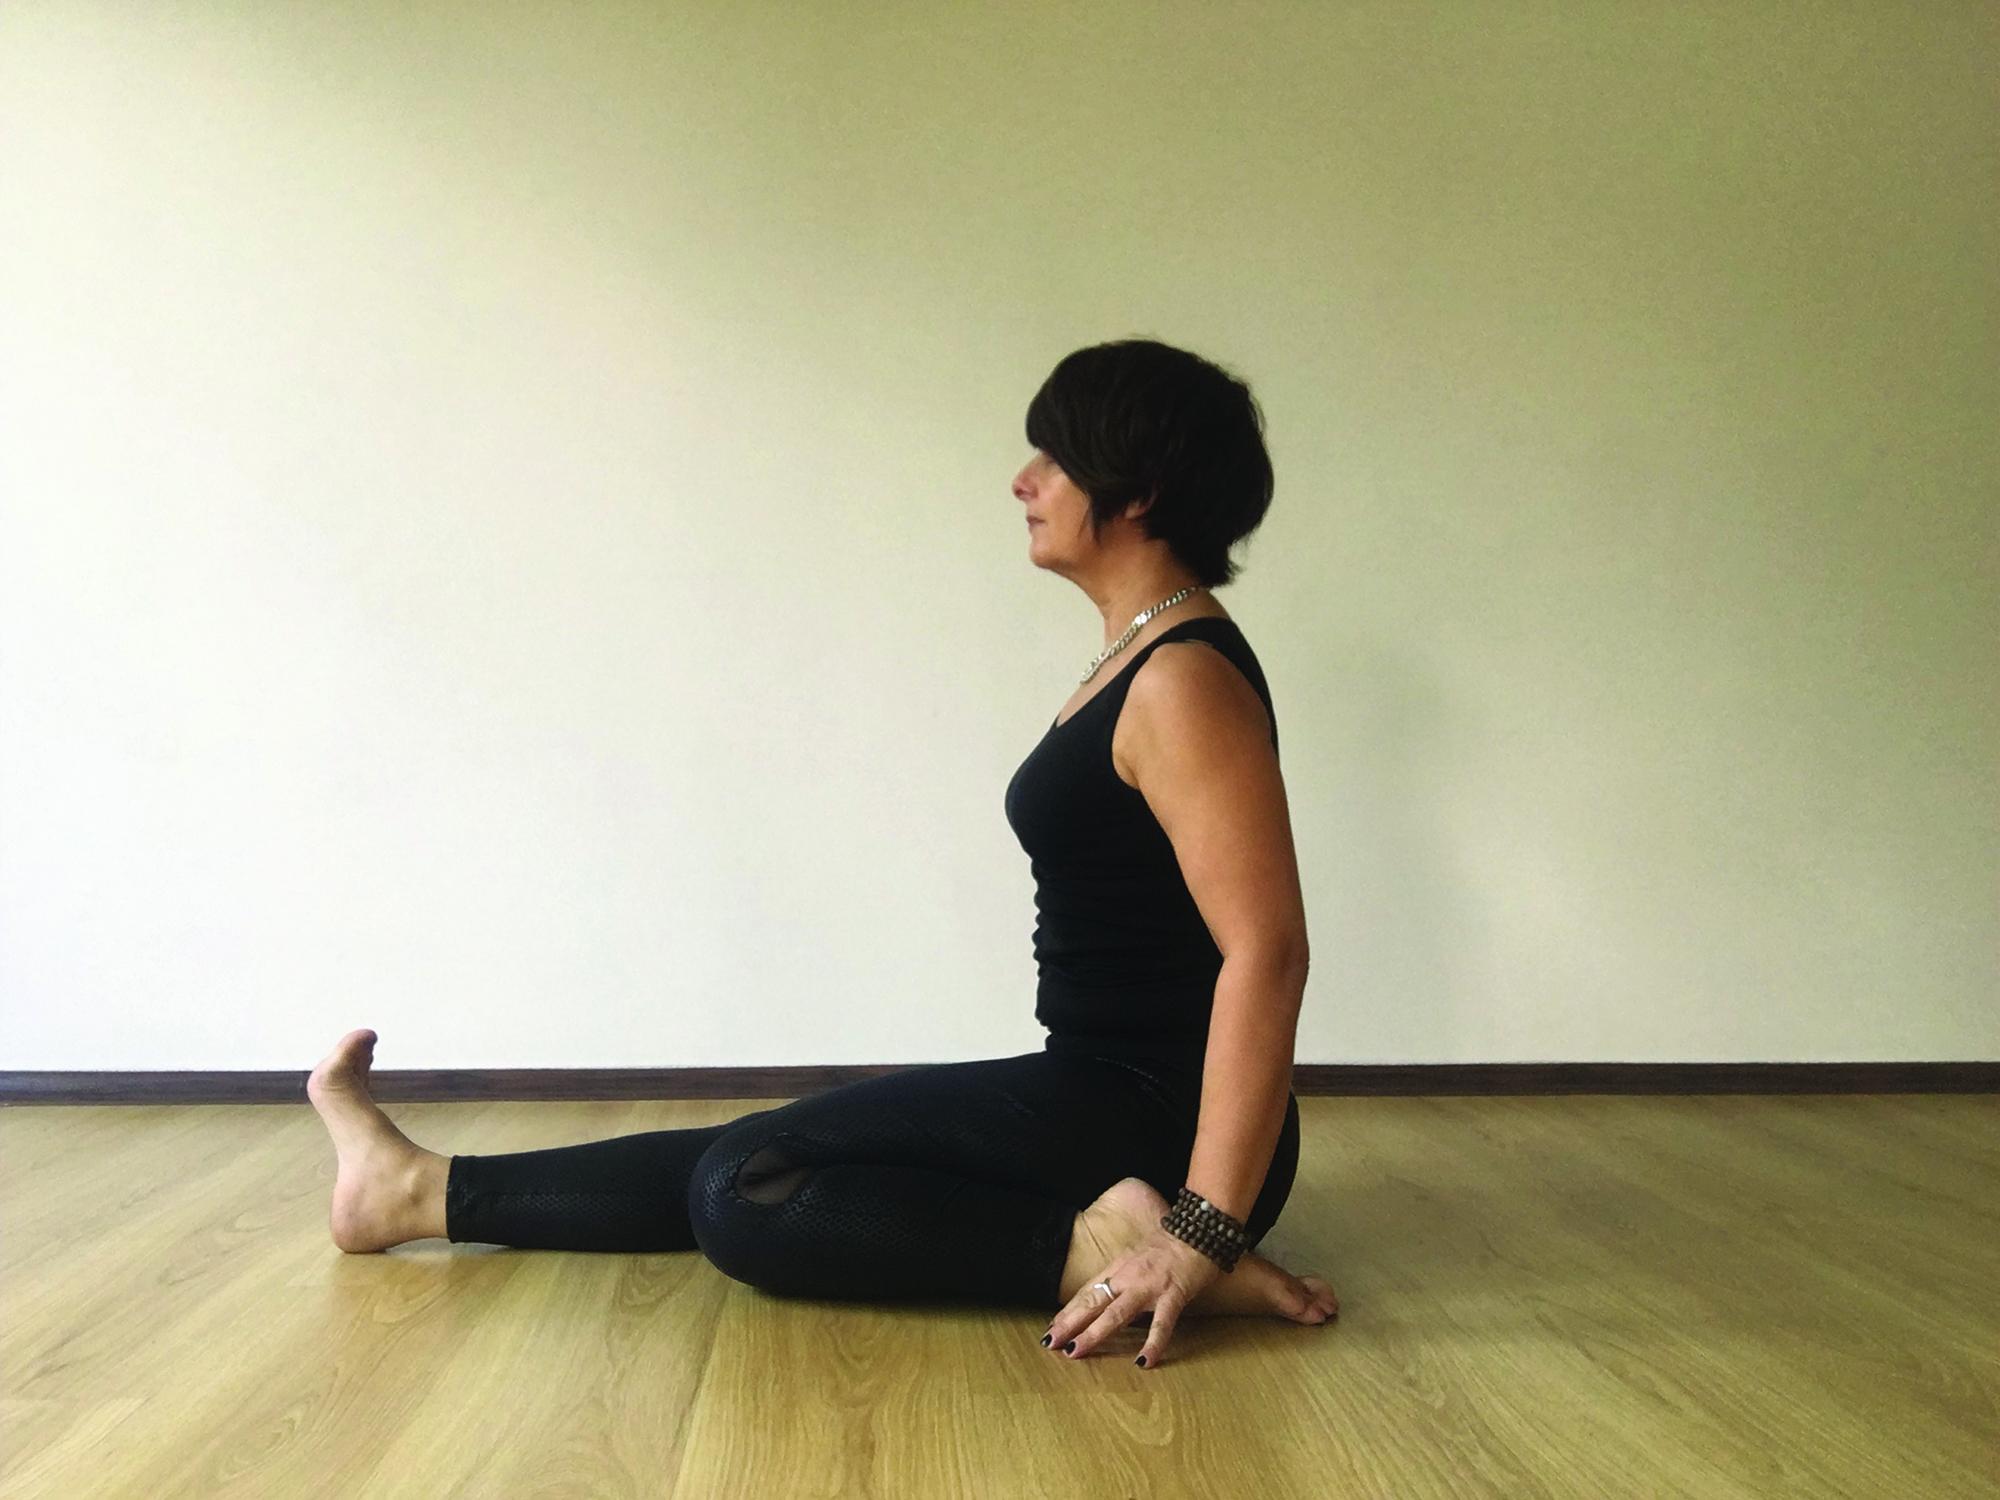 HALF SADDLE/HERO POSE - Yoga Magazine